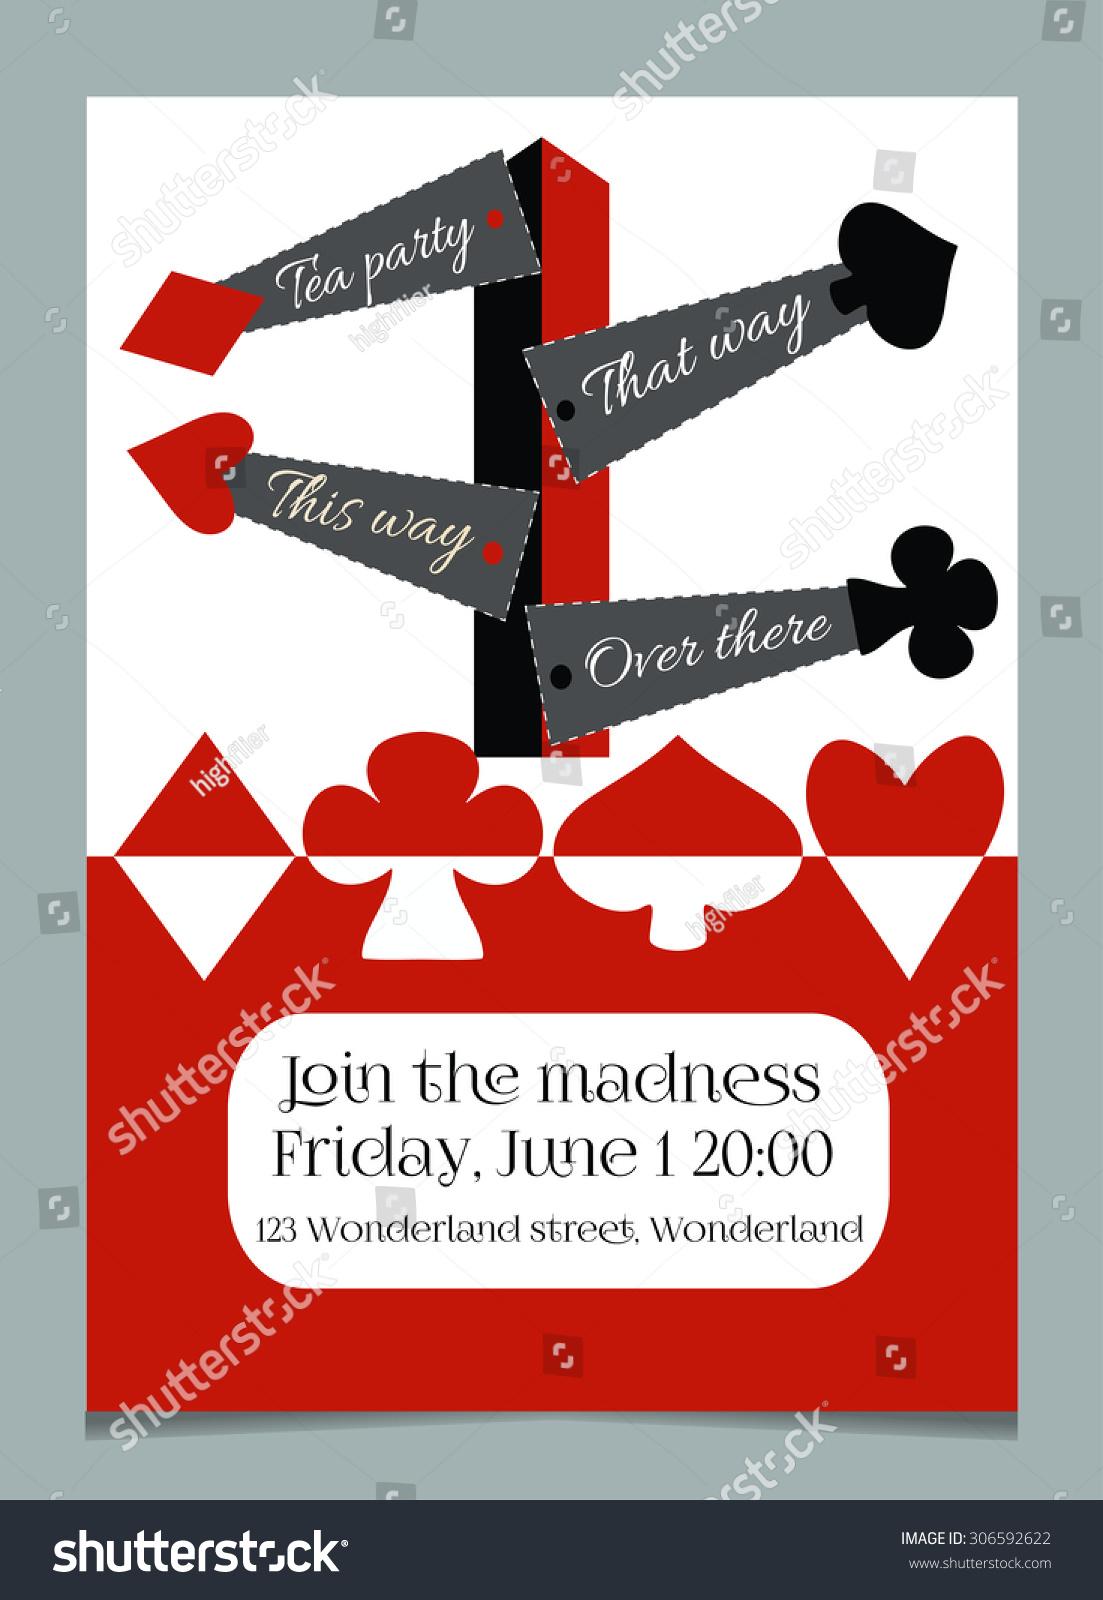 edit vectors free online  invitation card  shutterstock